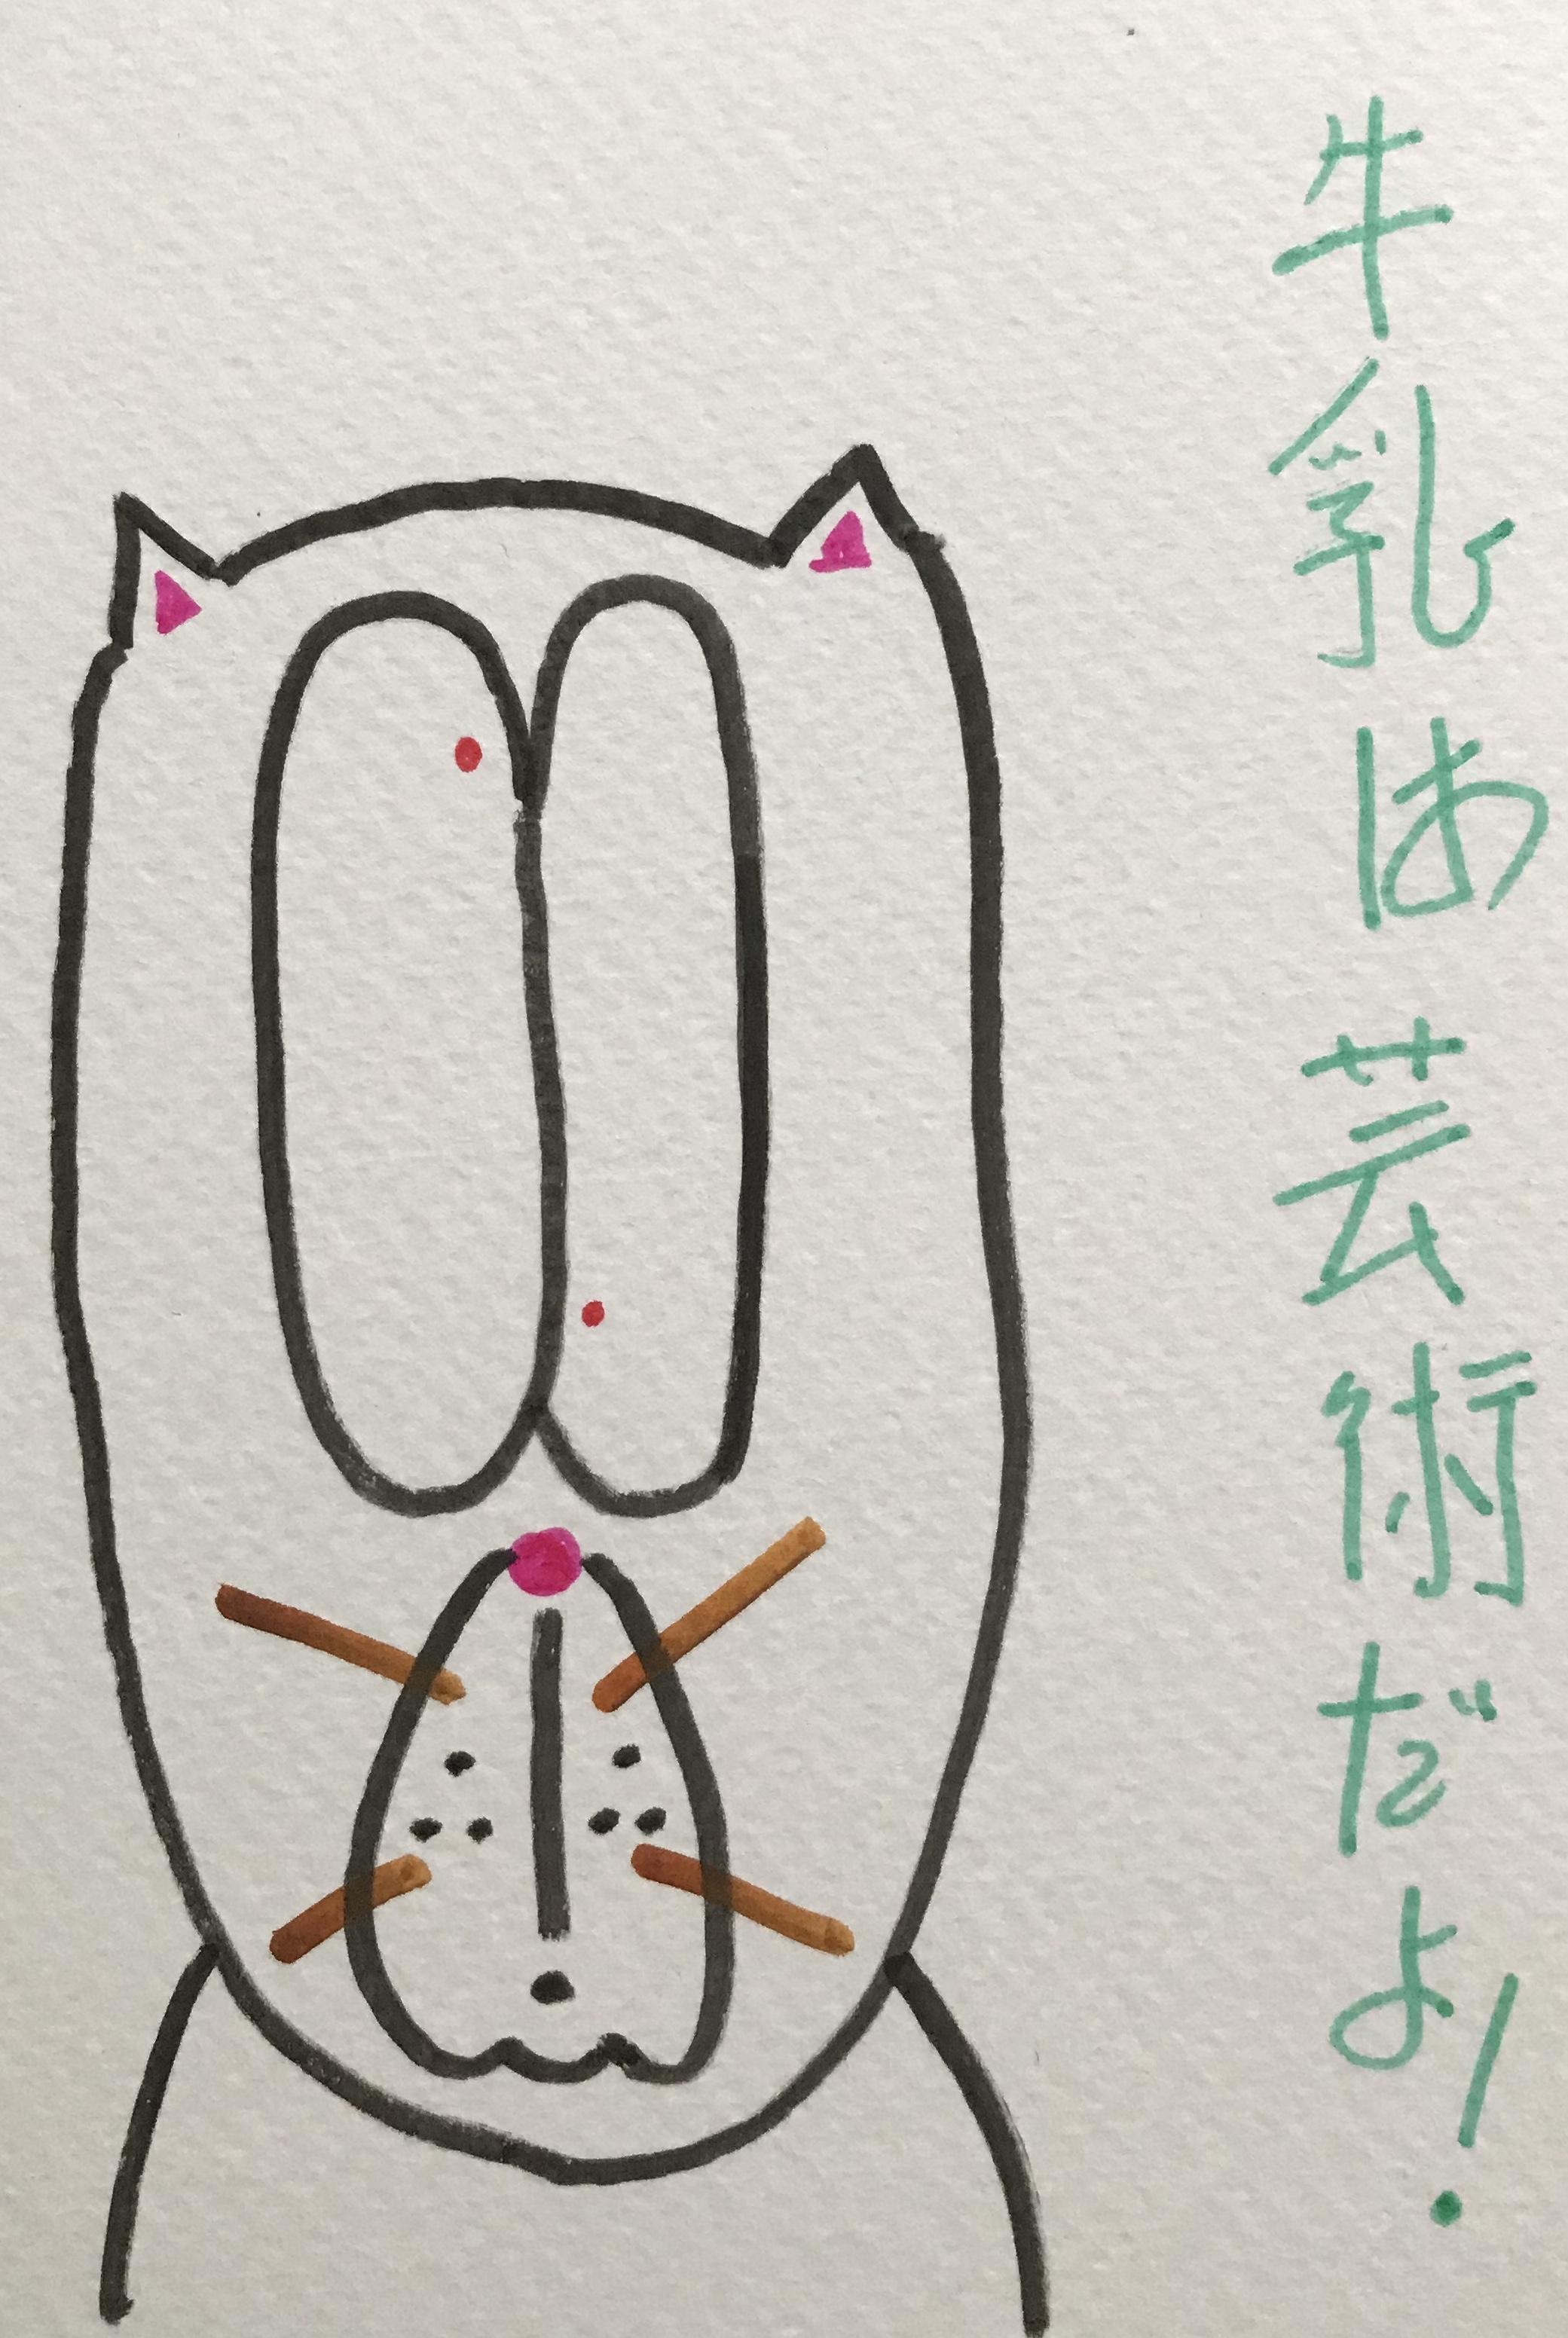 Miylk is art Japanese